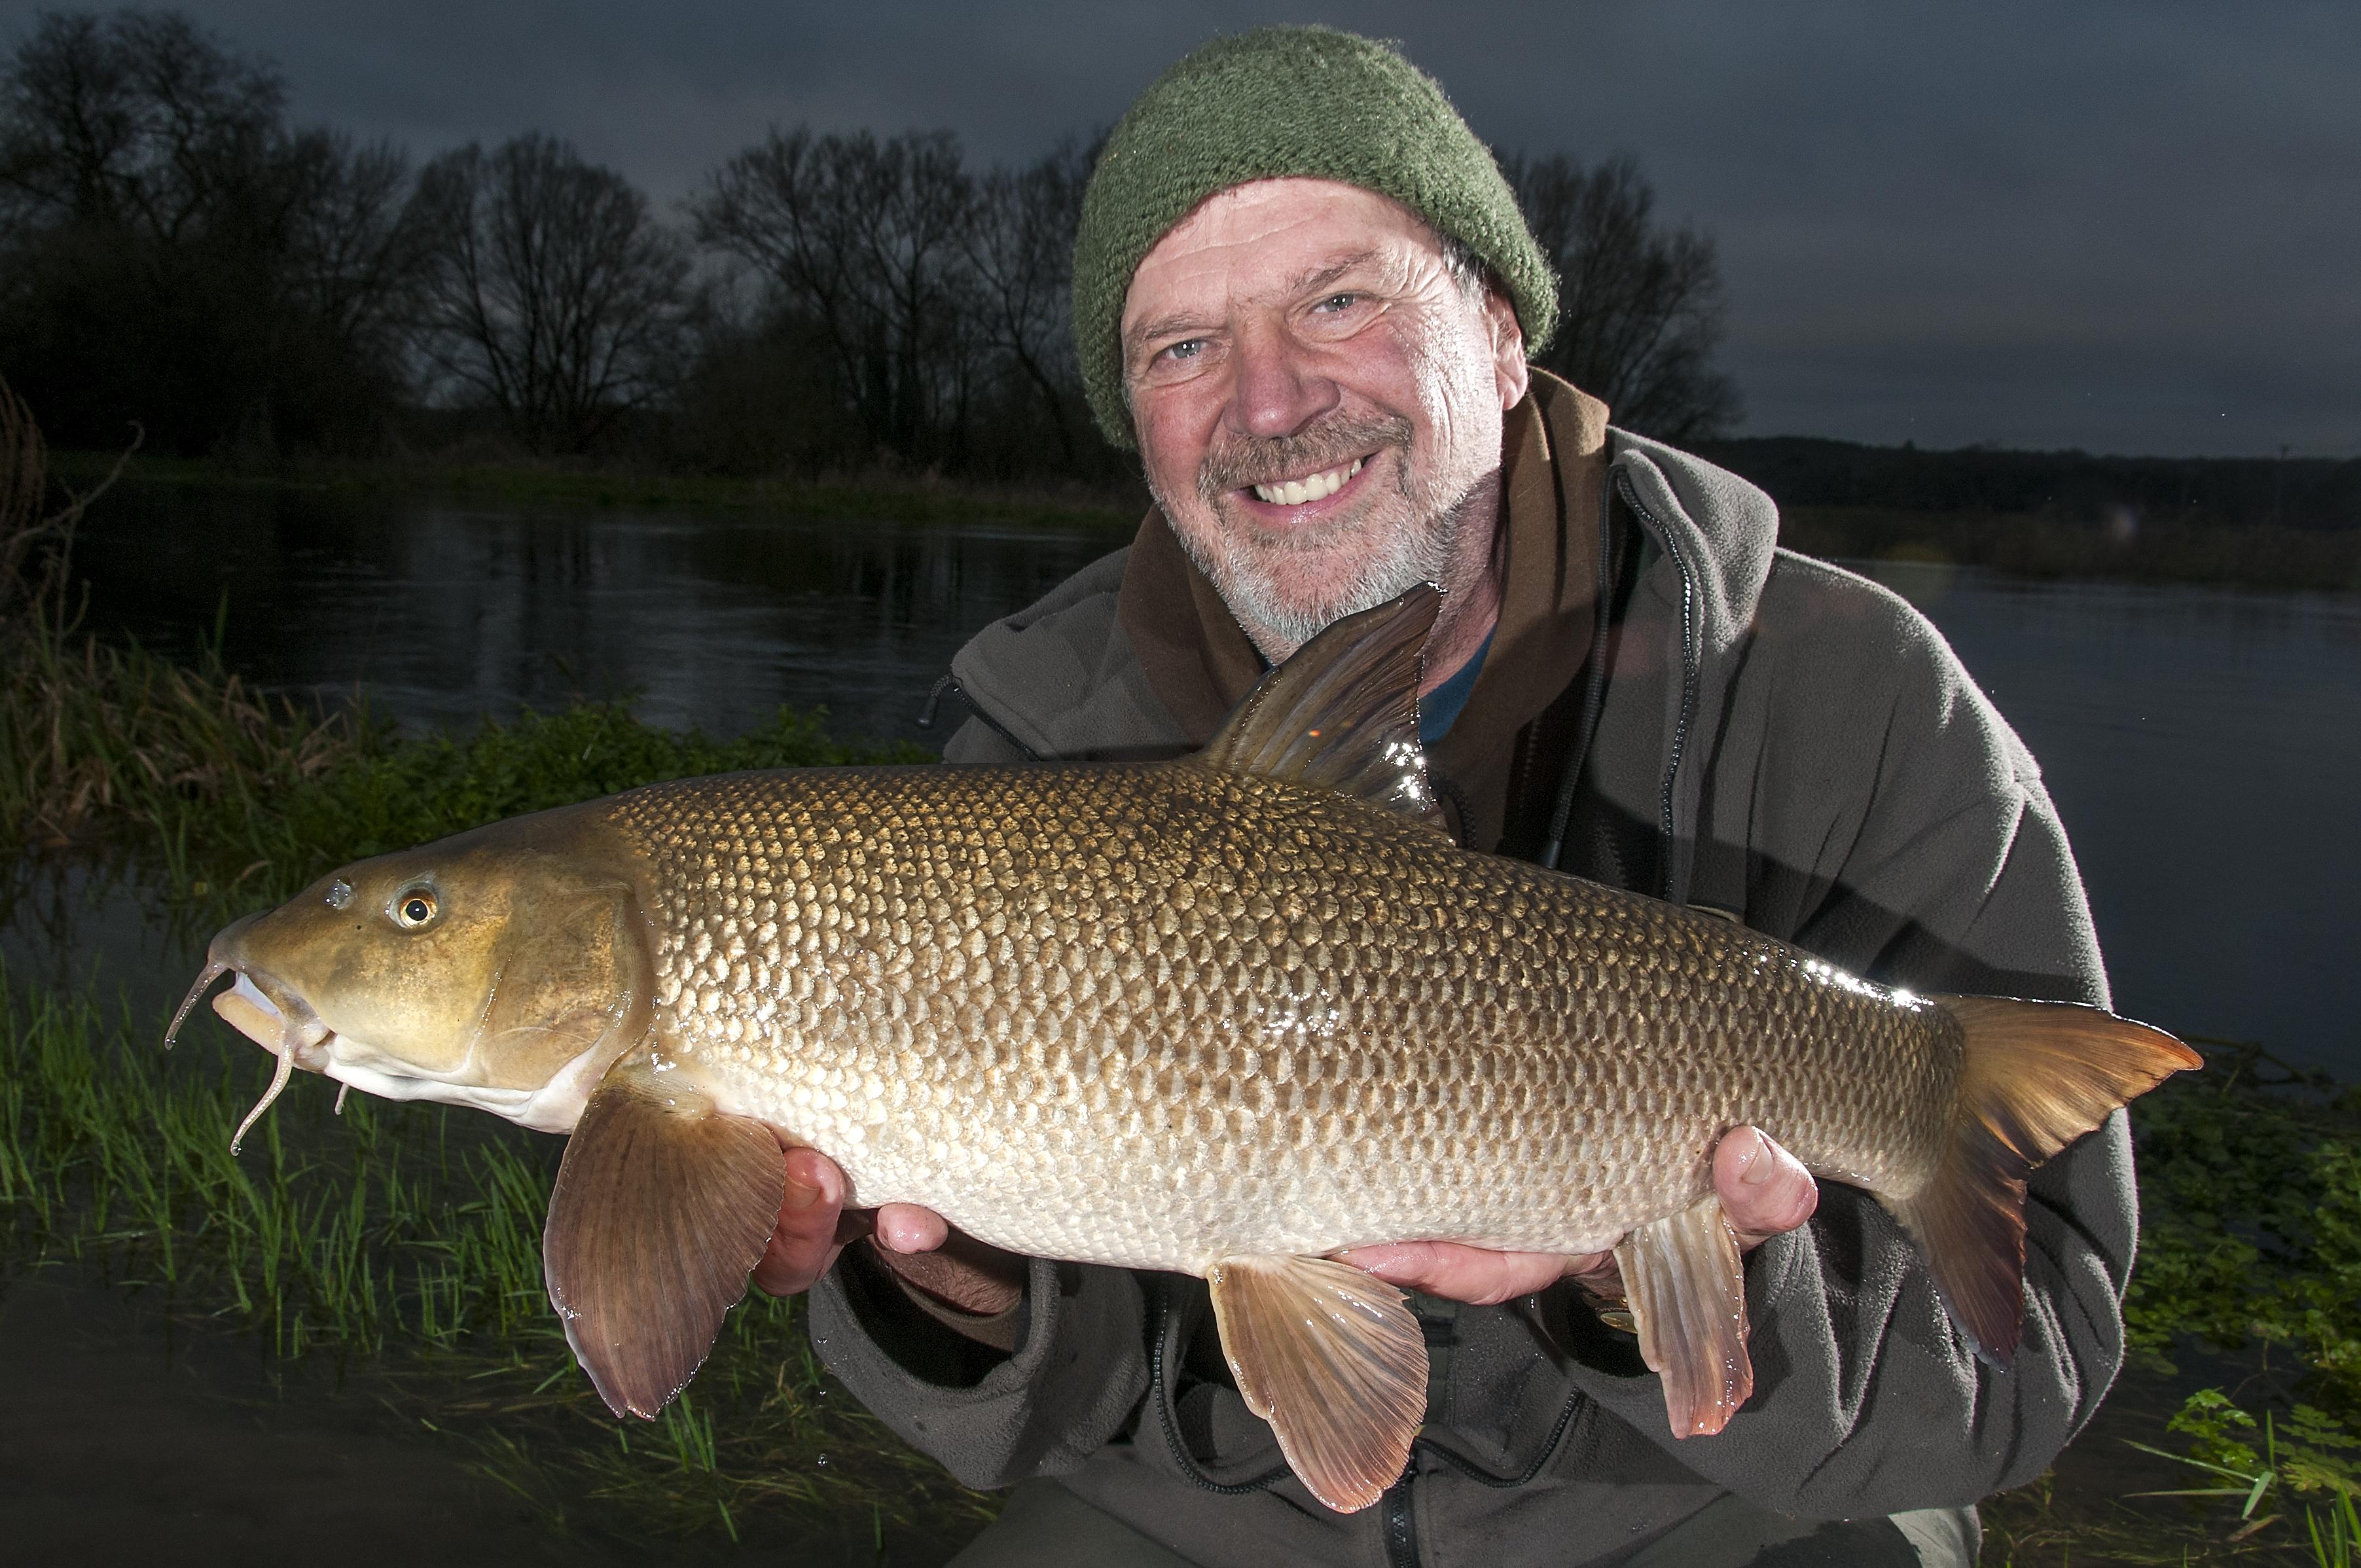 Barbel fishing tips to give you late-season success